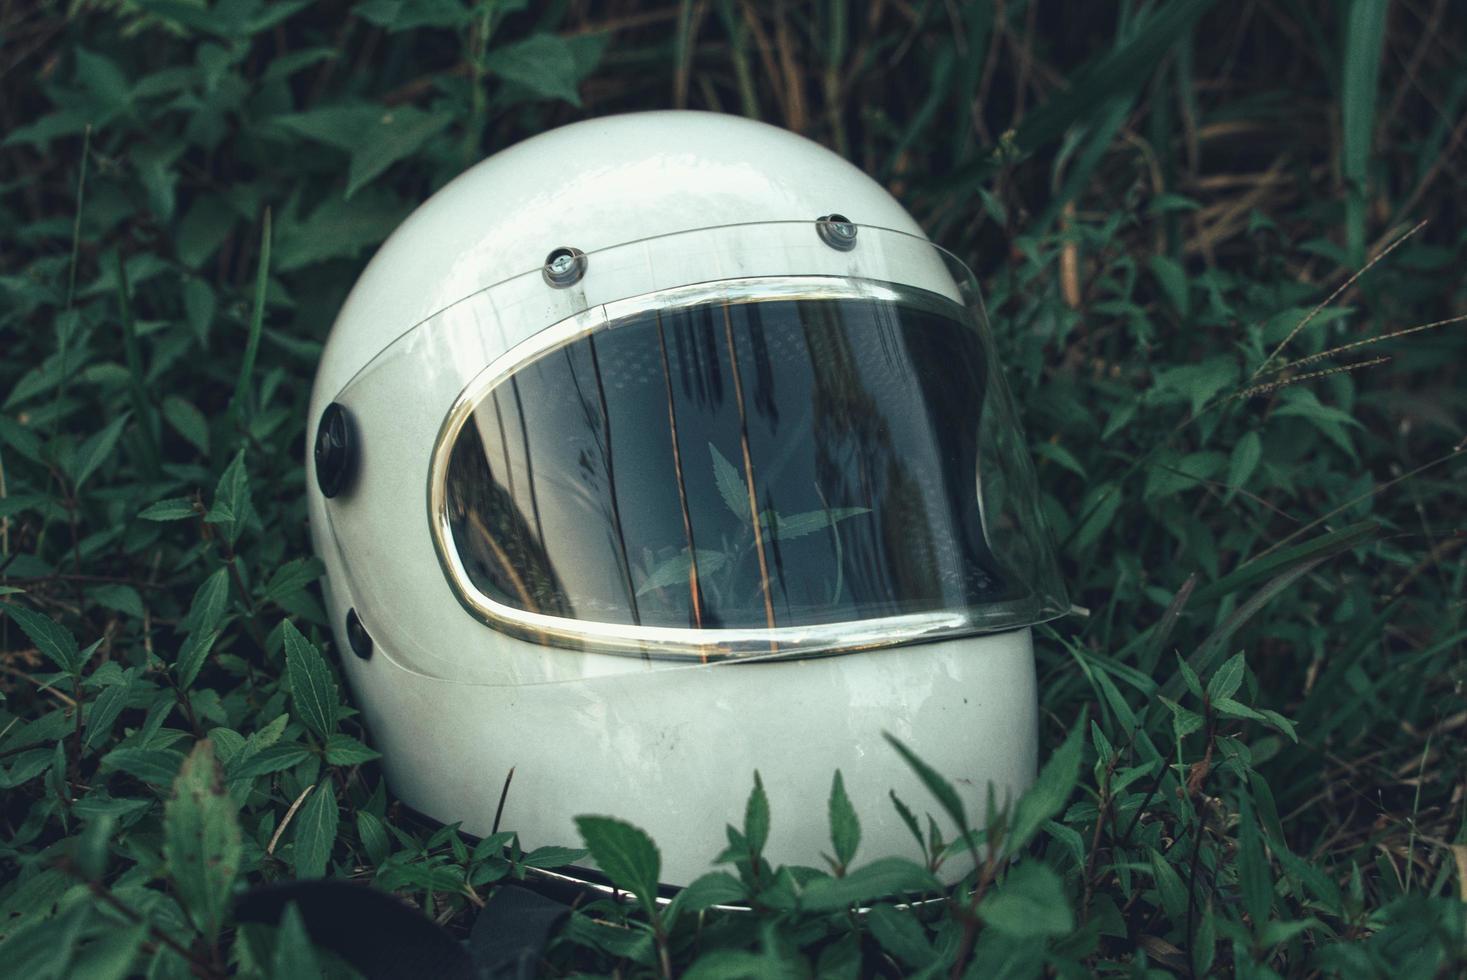 casco bianco in erba foto